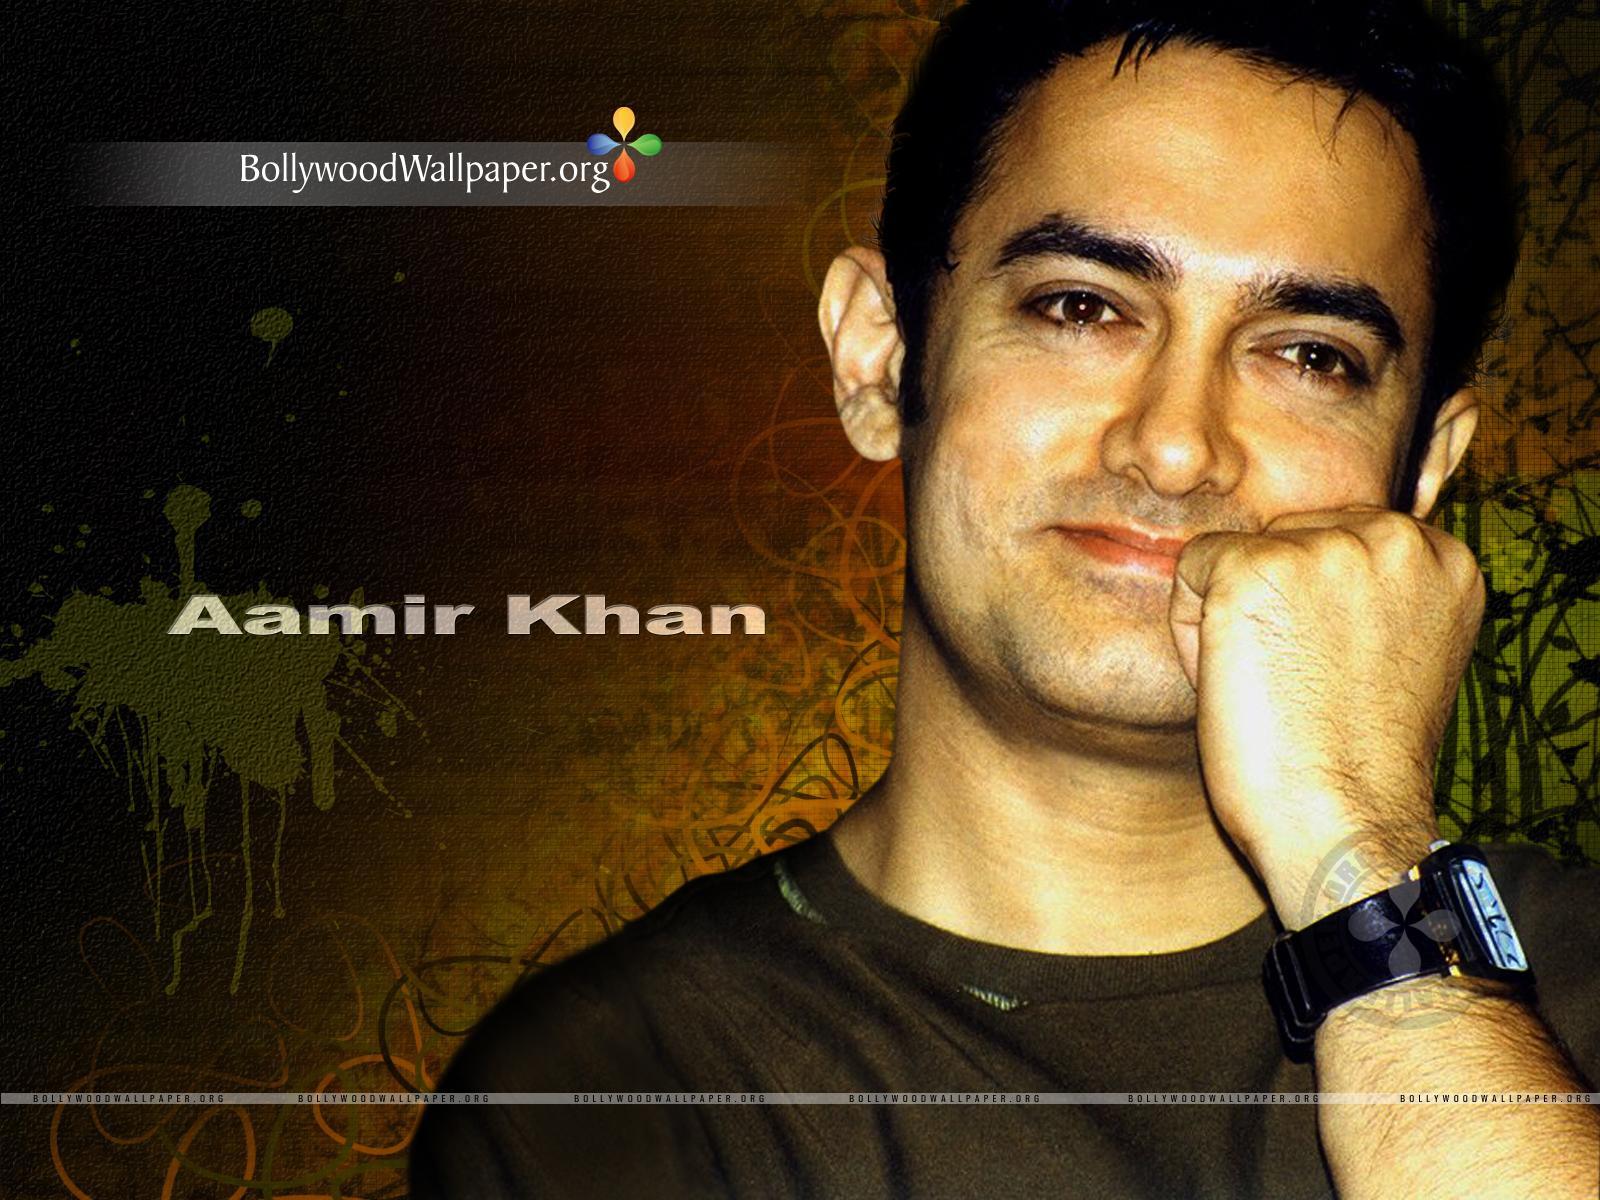 http://1.bp.blogspot.com/_7bzgbSXkpyo/TKBtDmbsr7I/AAAAAAAAAA8/sXoMDQul7Yw/s1600/Aamir-Khan-Wallpaper-004.jpg